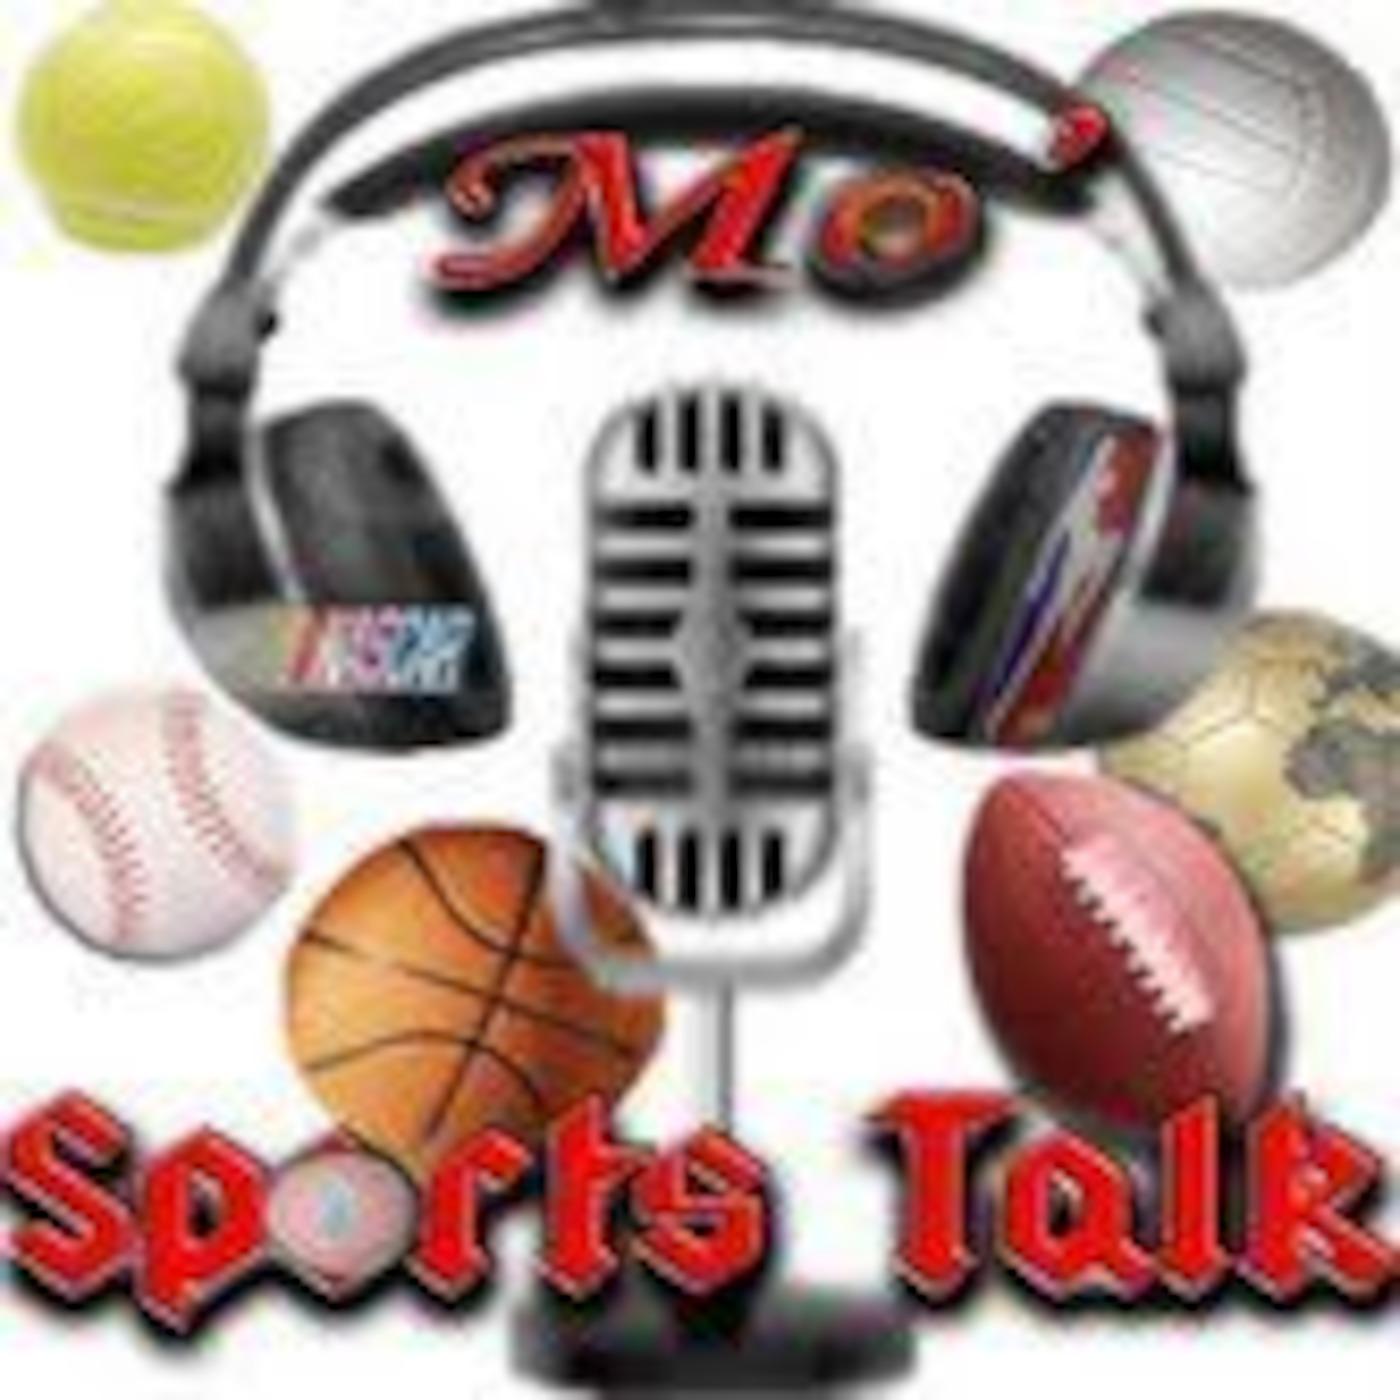 Mo' SportsTalk